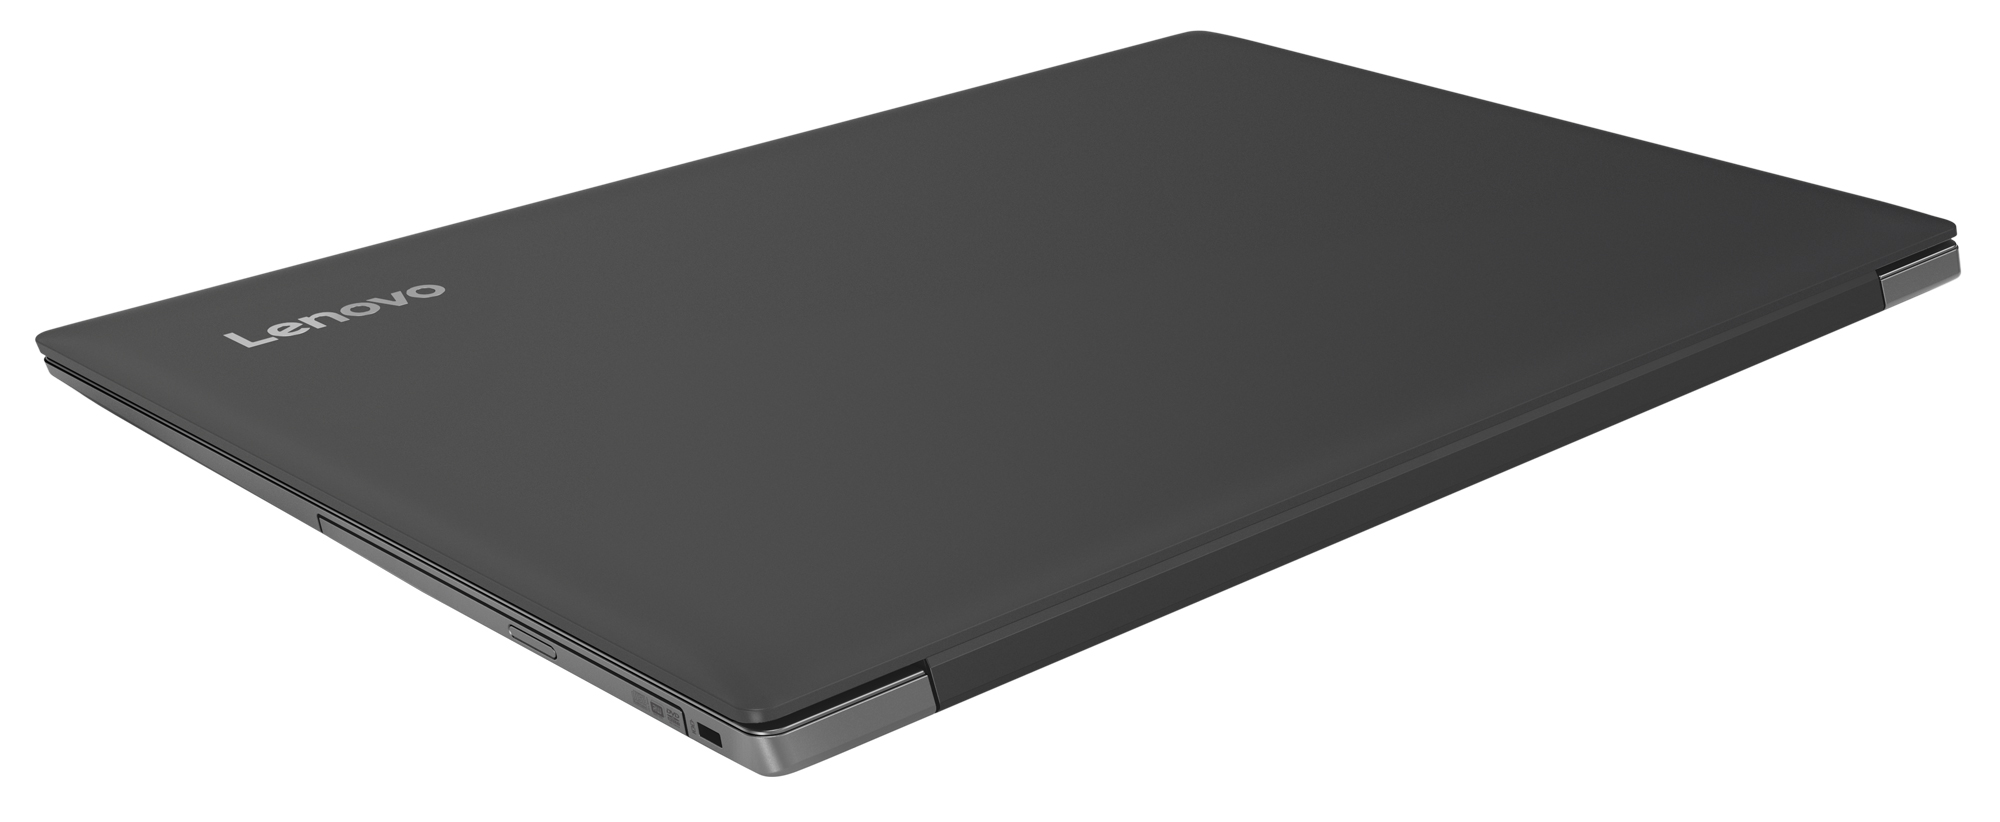 Фото  Ноутбук Lenovo ideapad 330-17IKBR Onyx Black (81DM007MRA)